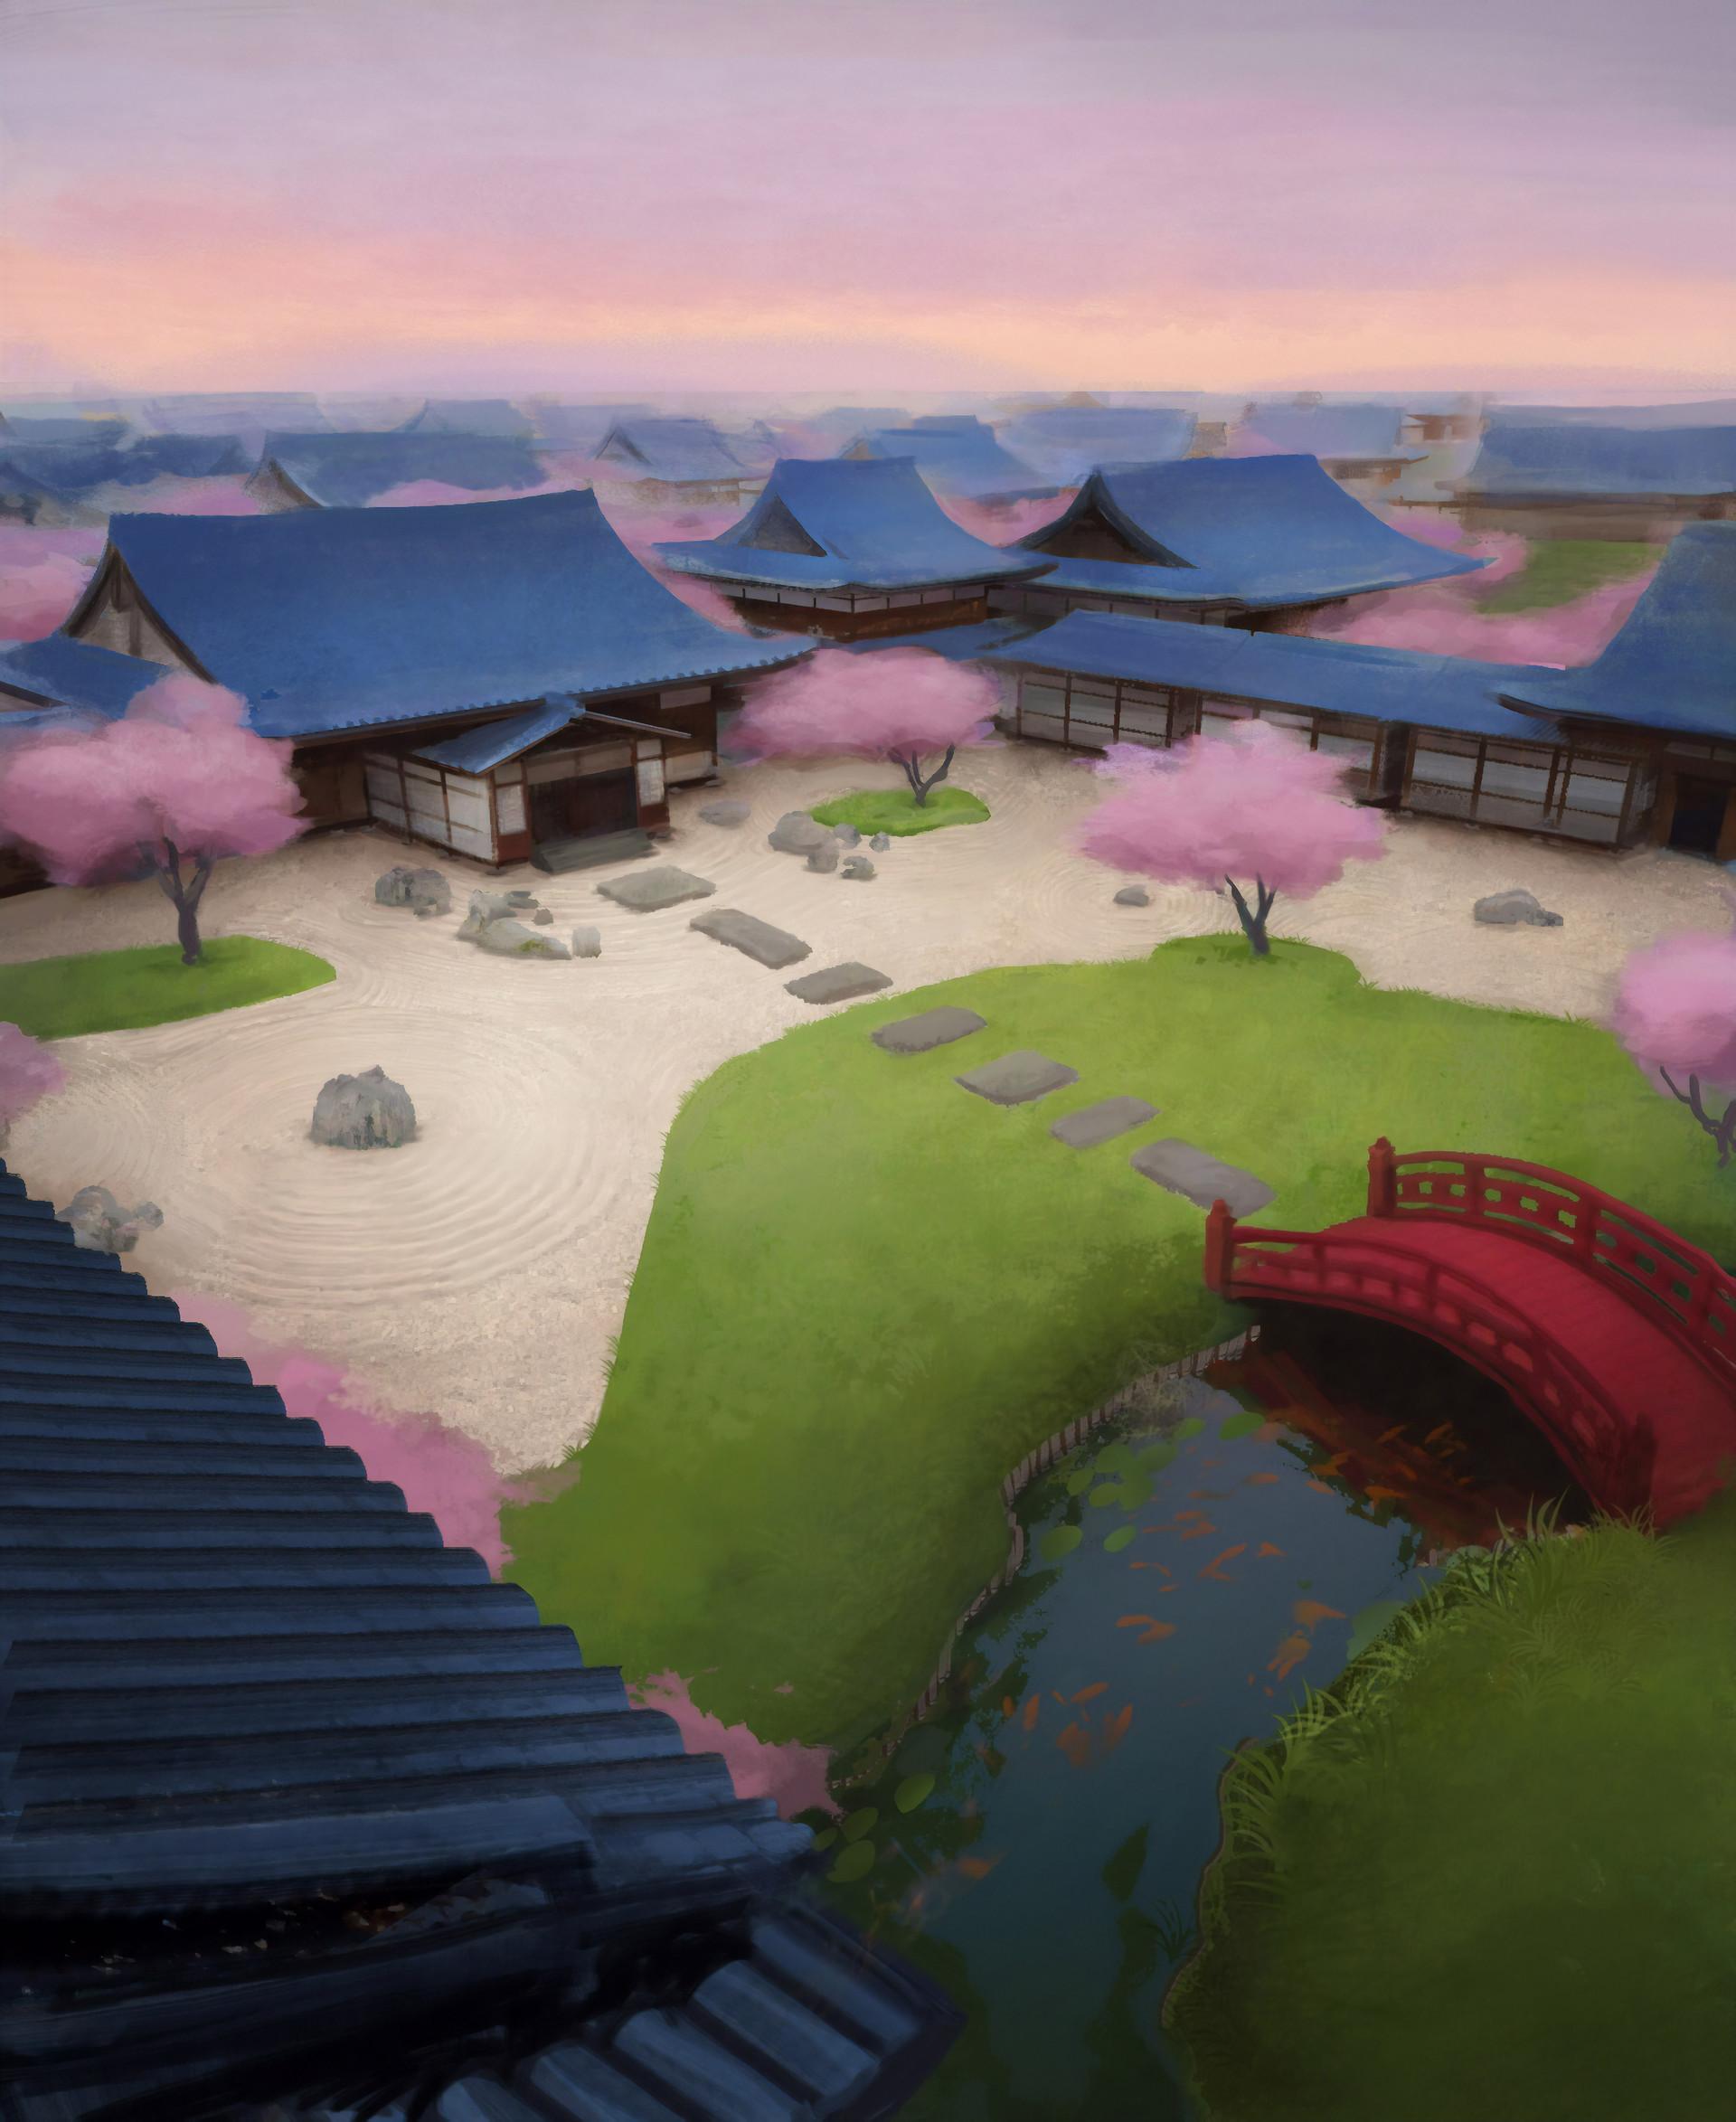 Olly lawson samurai mansion